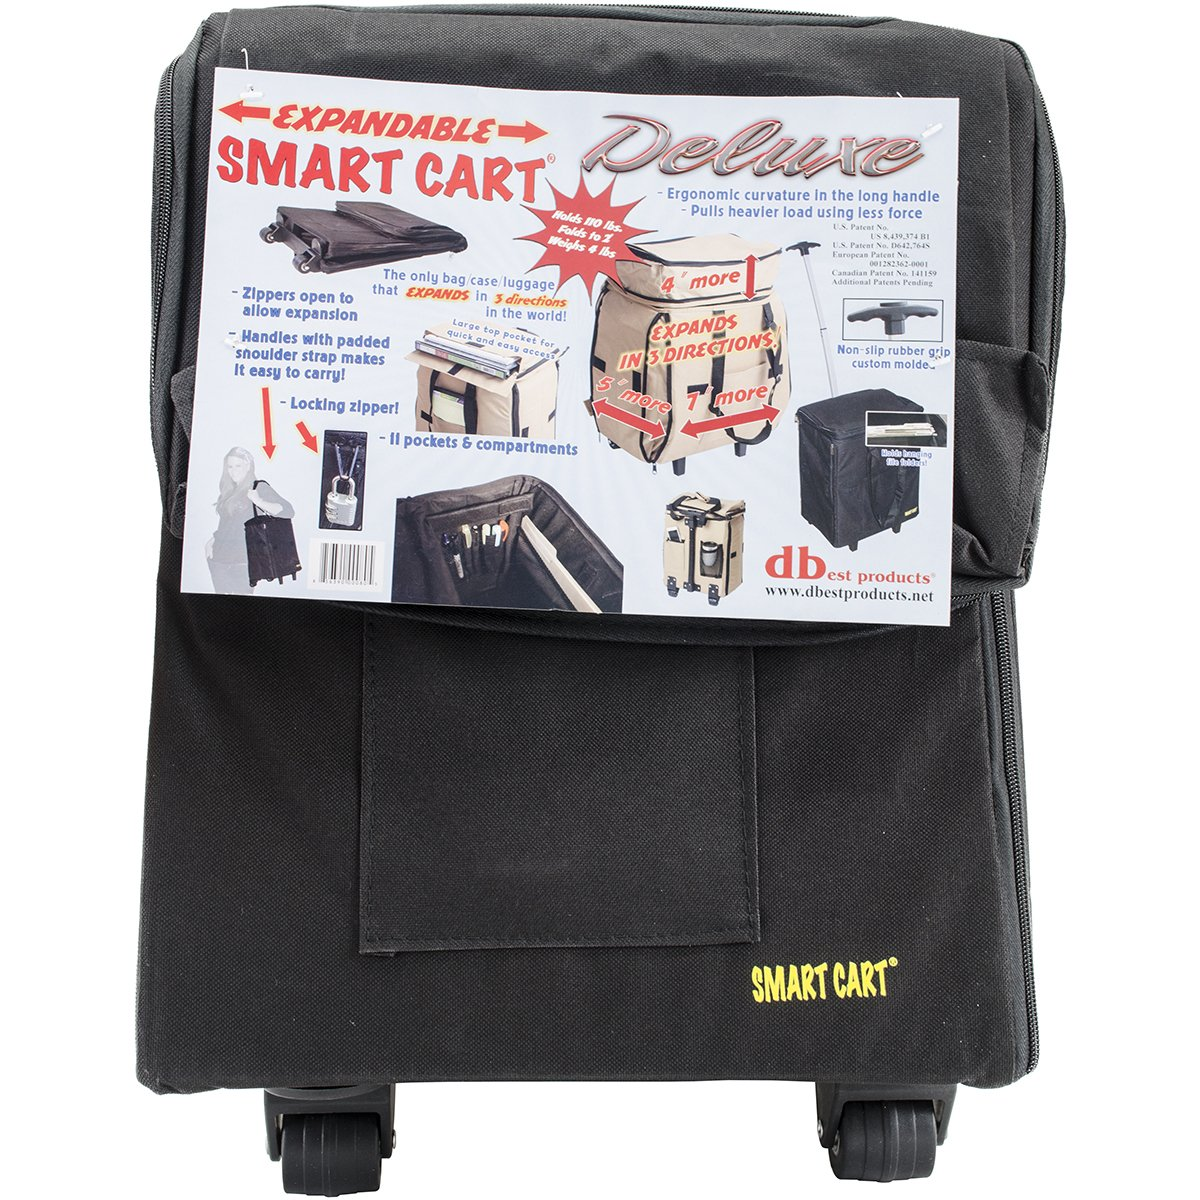 2b898fae9442 Smart Cart, Deluxe, Black Rolling Multipurpose Collapsible Basket Cart  Scrapbooking